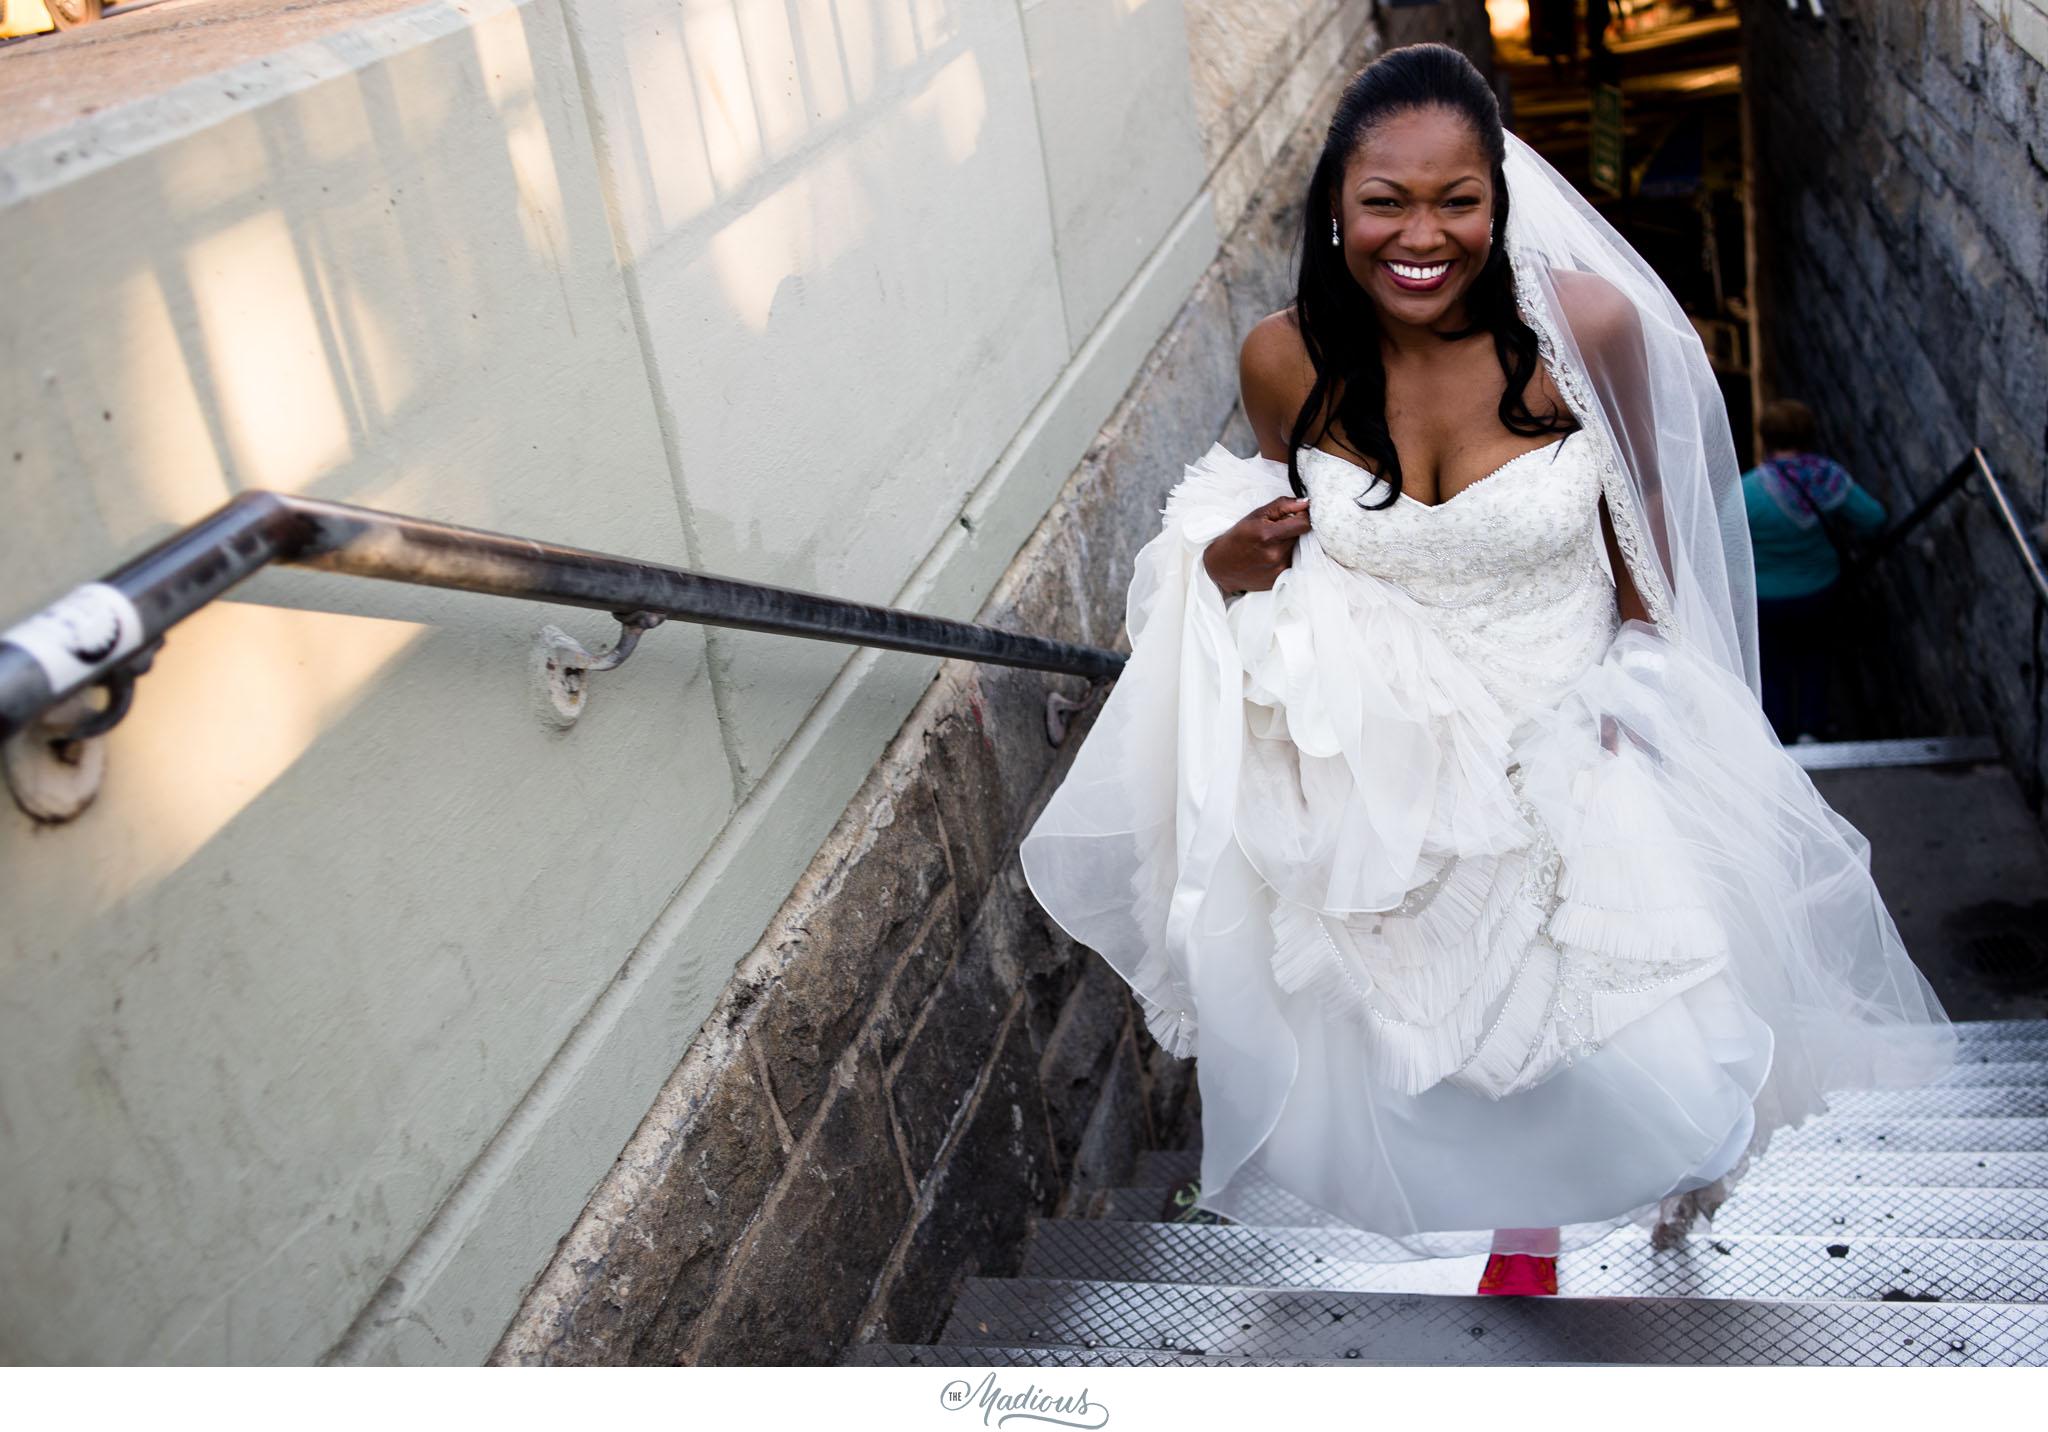 Dumbo Loft Wedding New York_0011.JPG